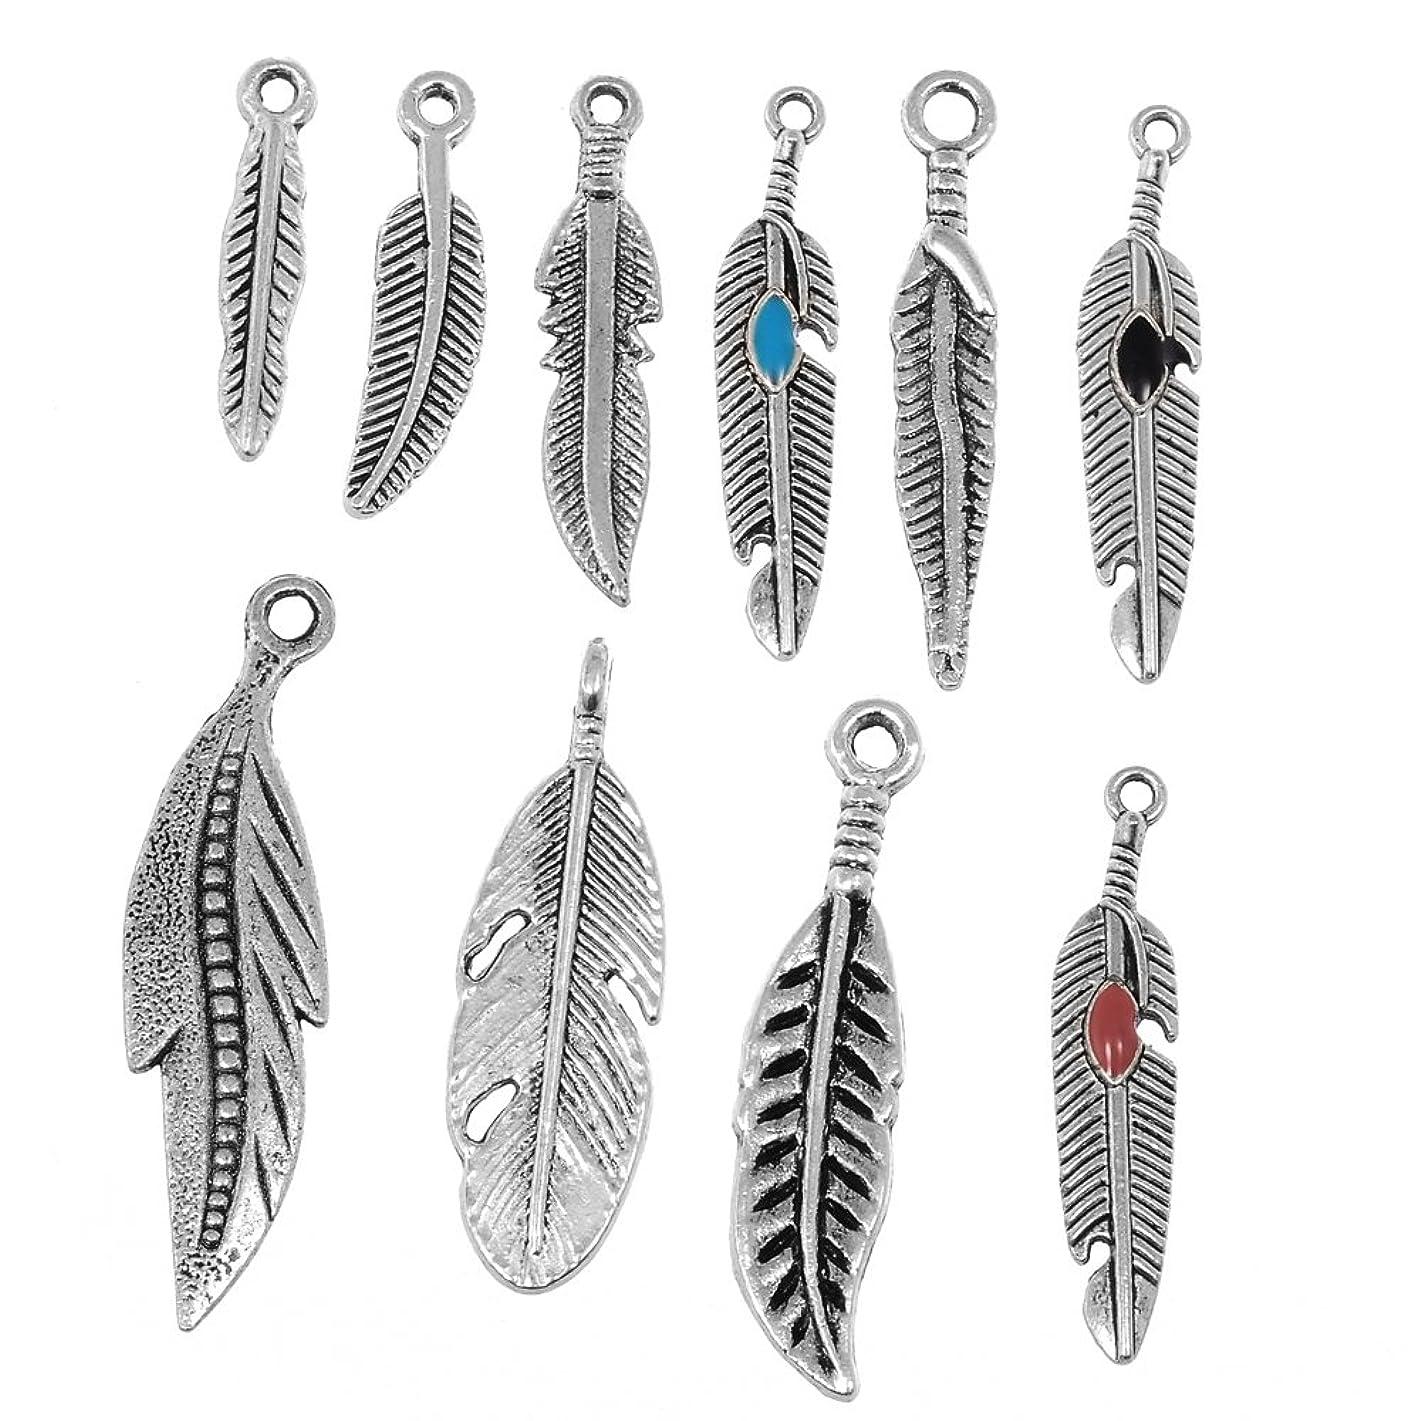 RUBYCA 100PCS Tibetan Silver Color Mix Feather Pendants Charms Bracelet Necklace Making Jewelry